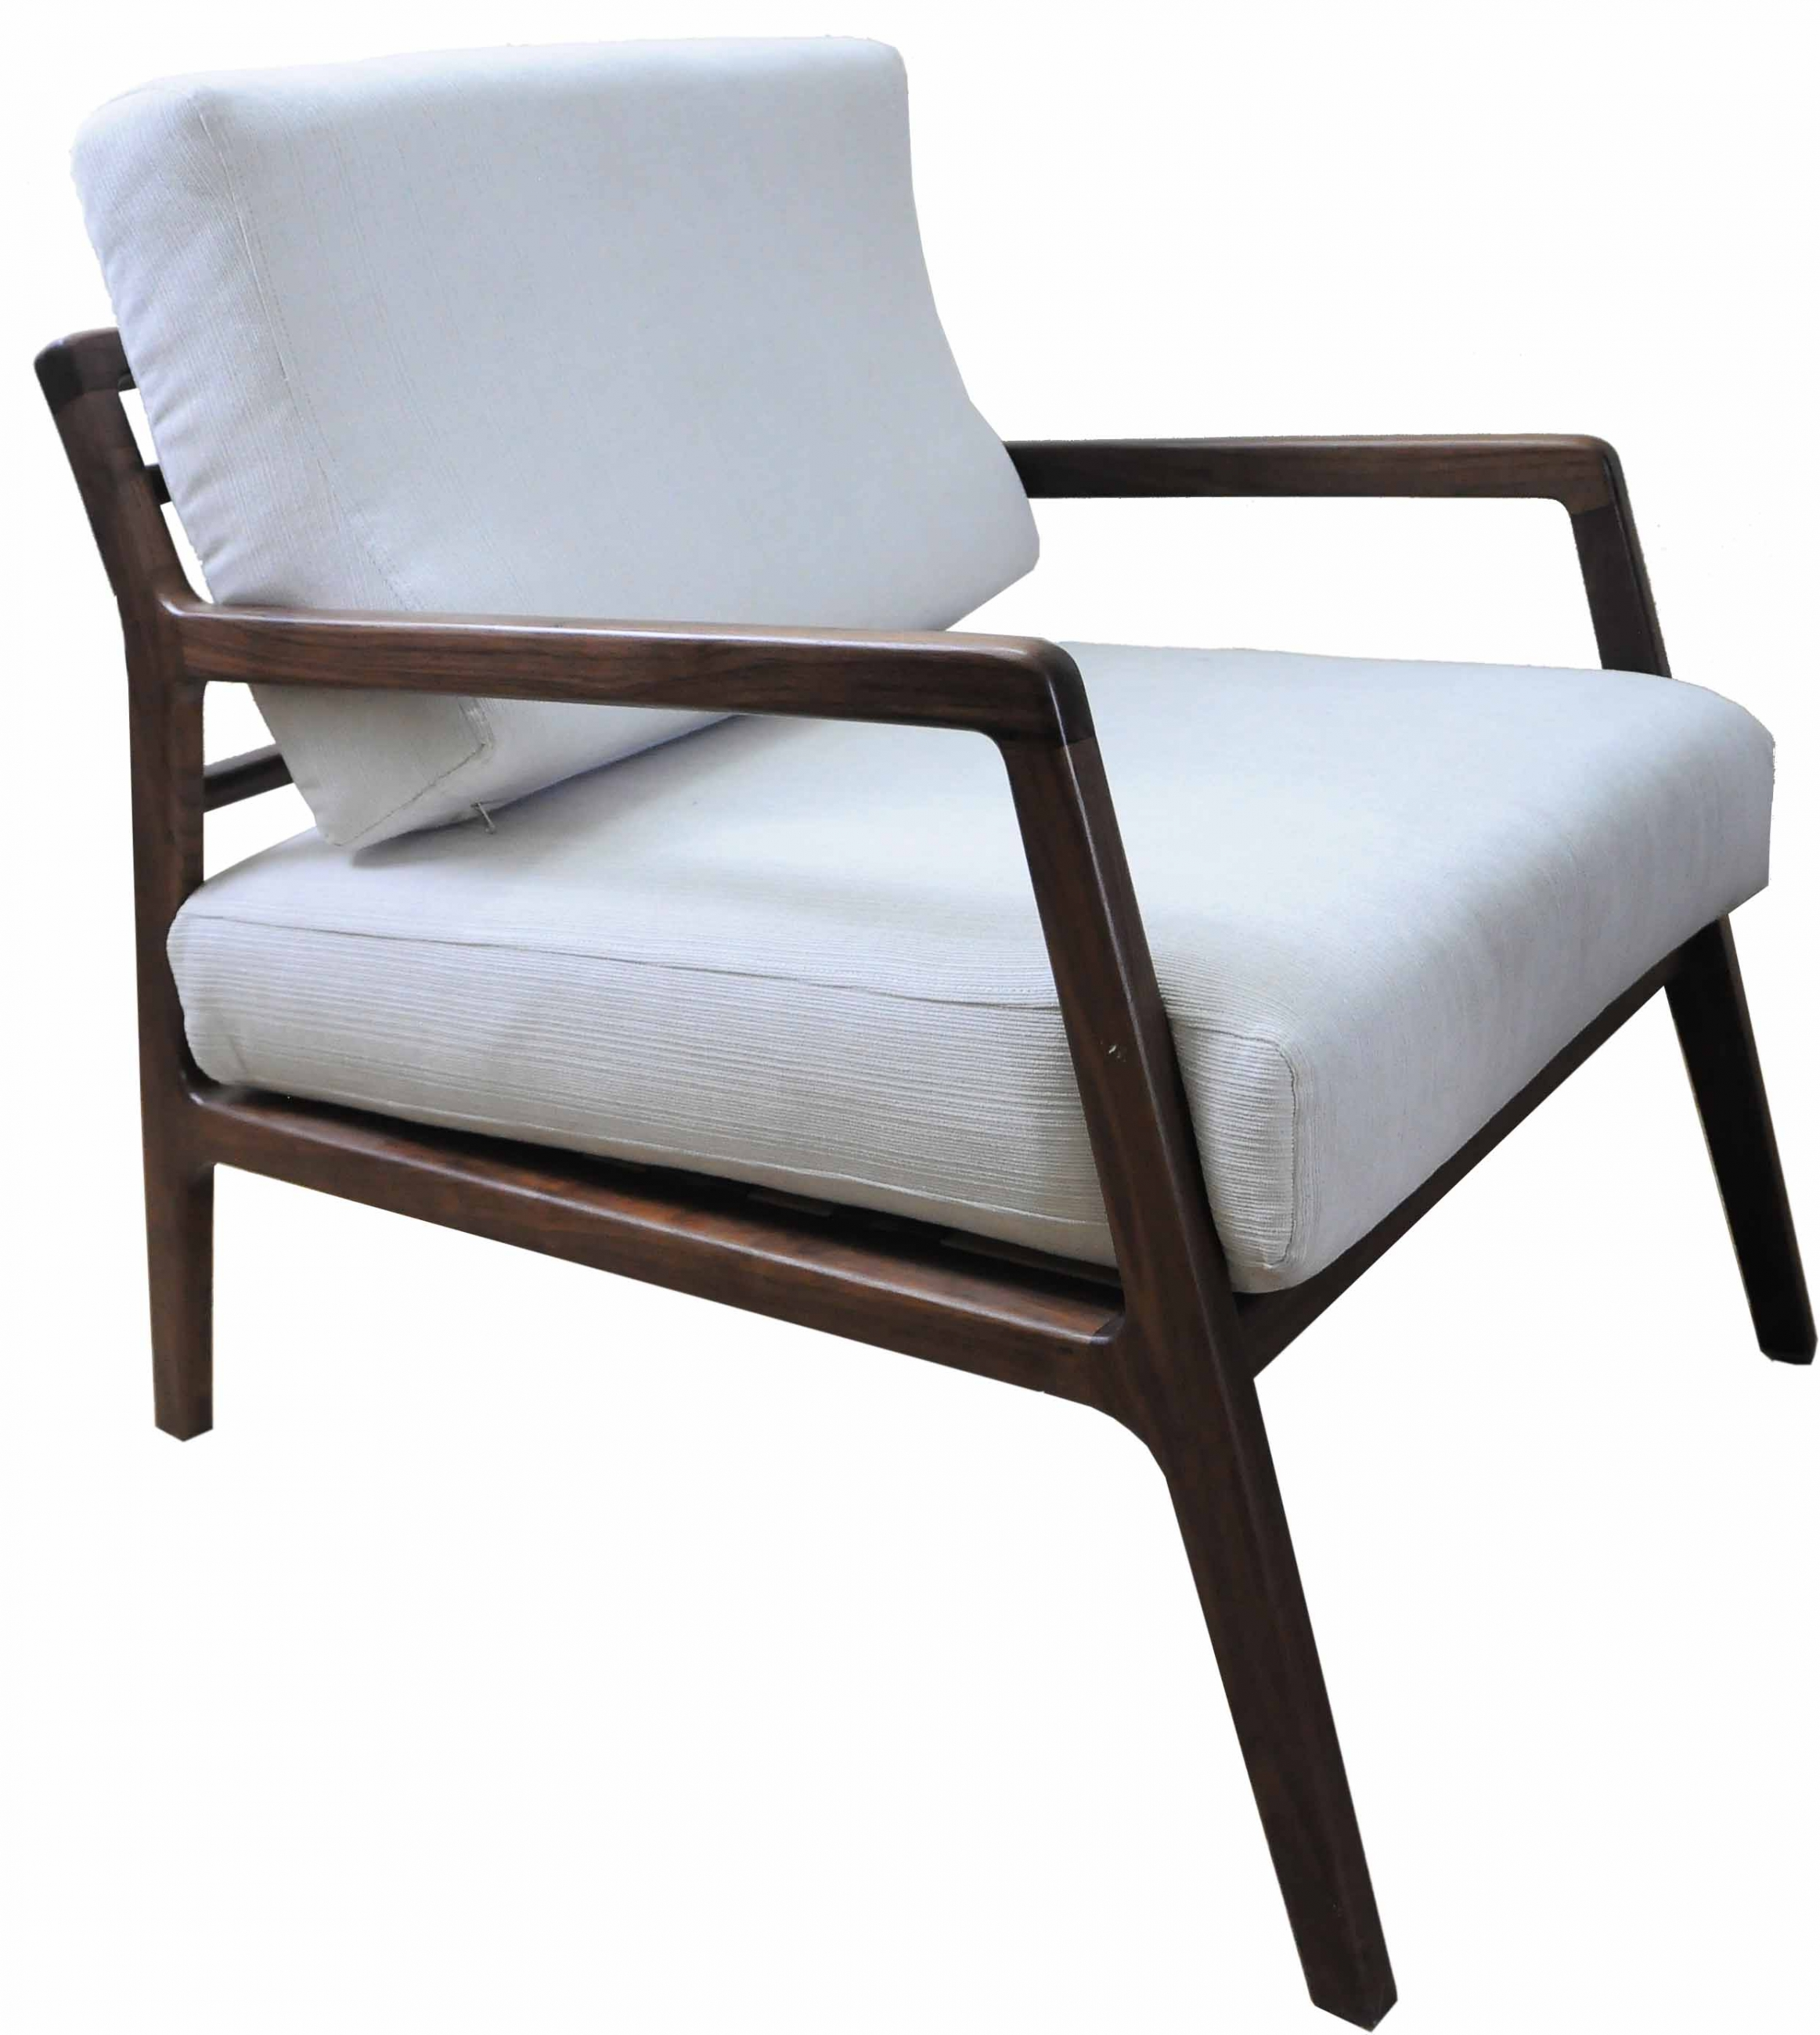 Sofa đơn - 004A